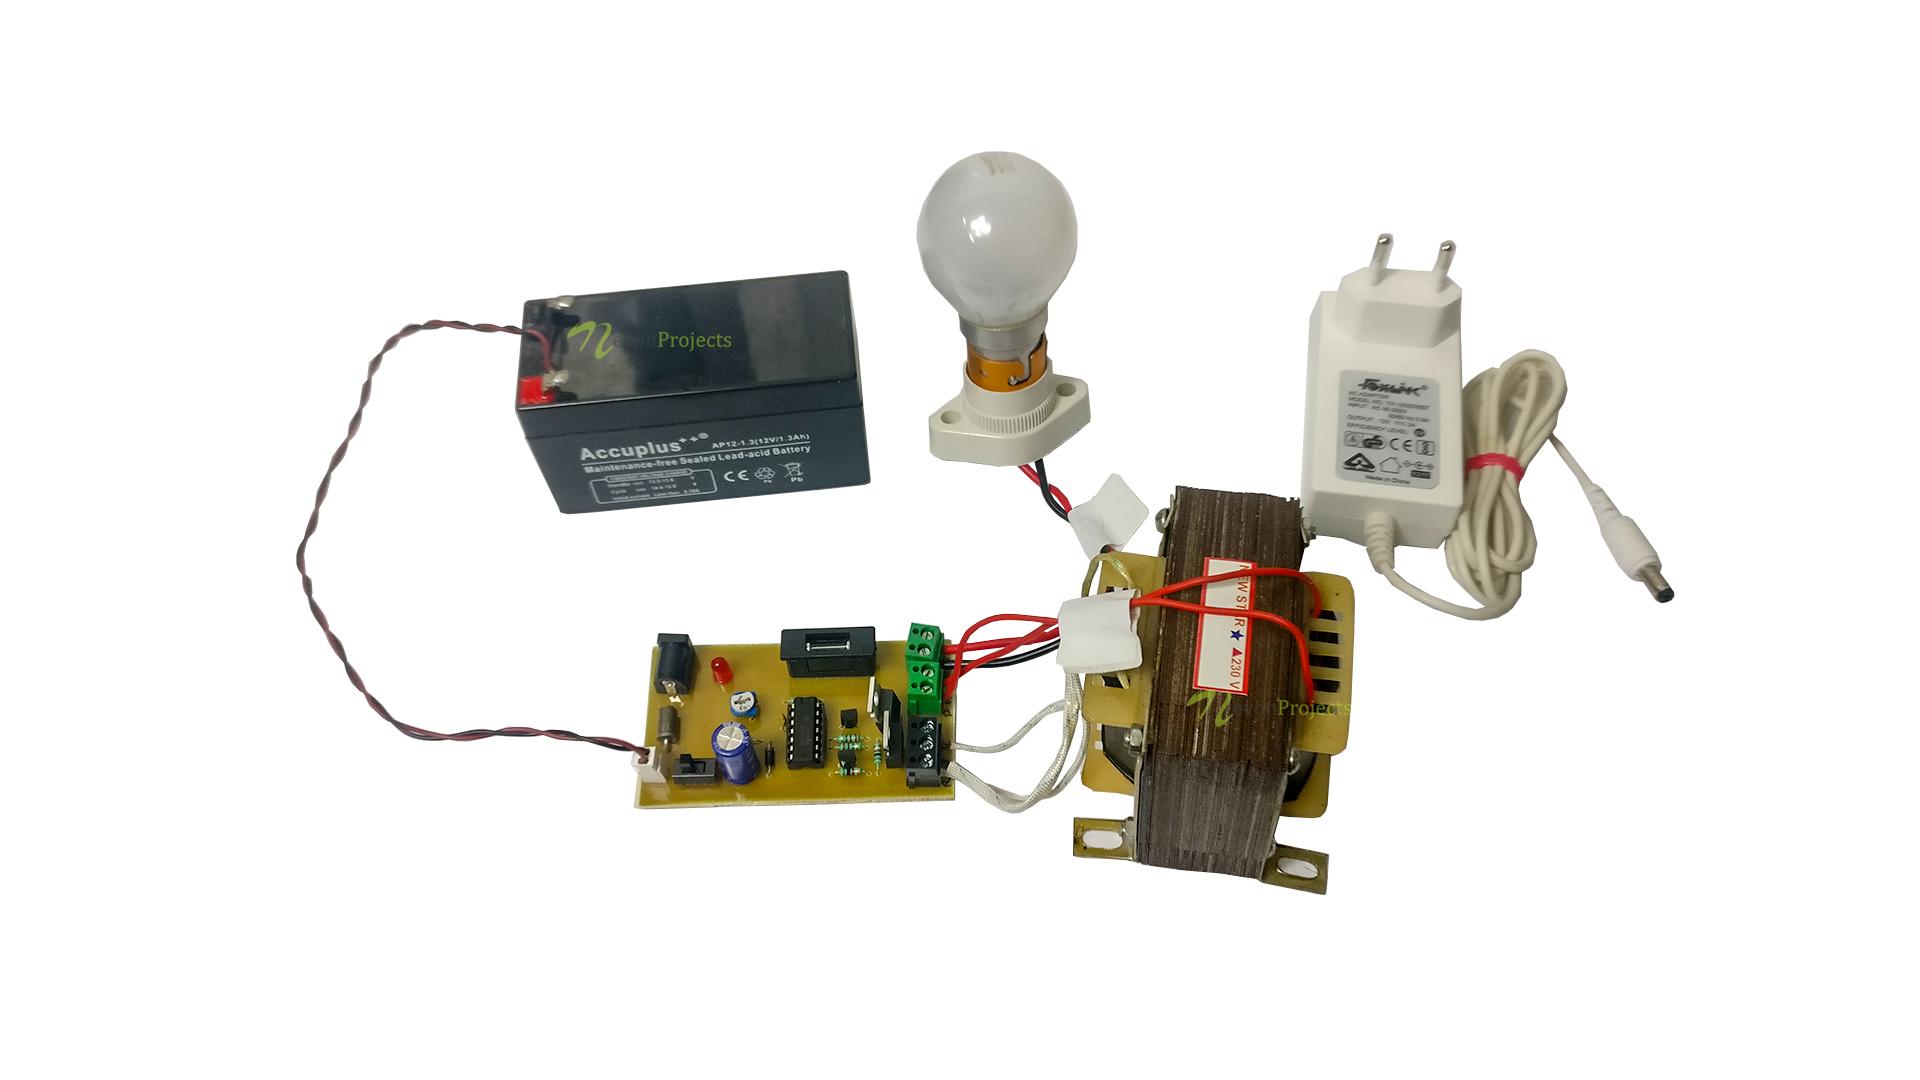 power efficient mini inverter projectScr Mini Power Inverter #20